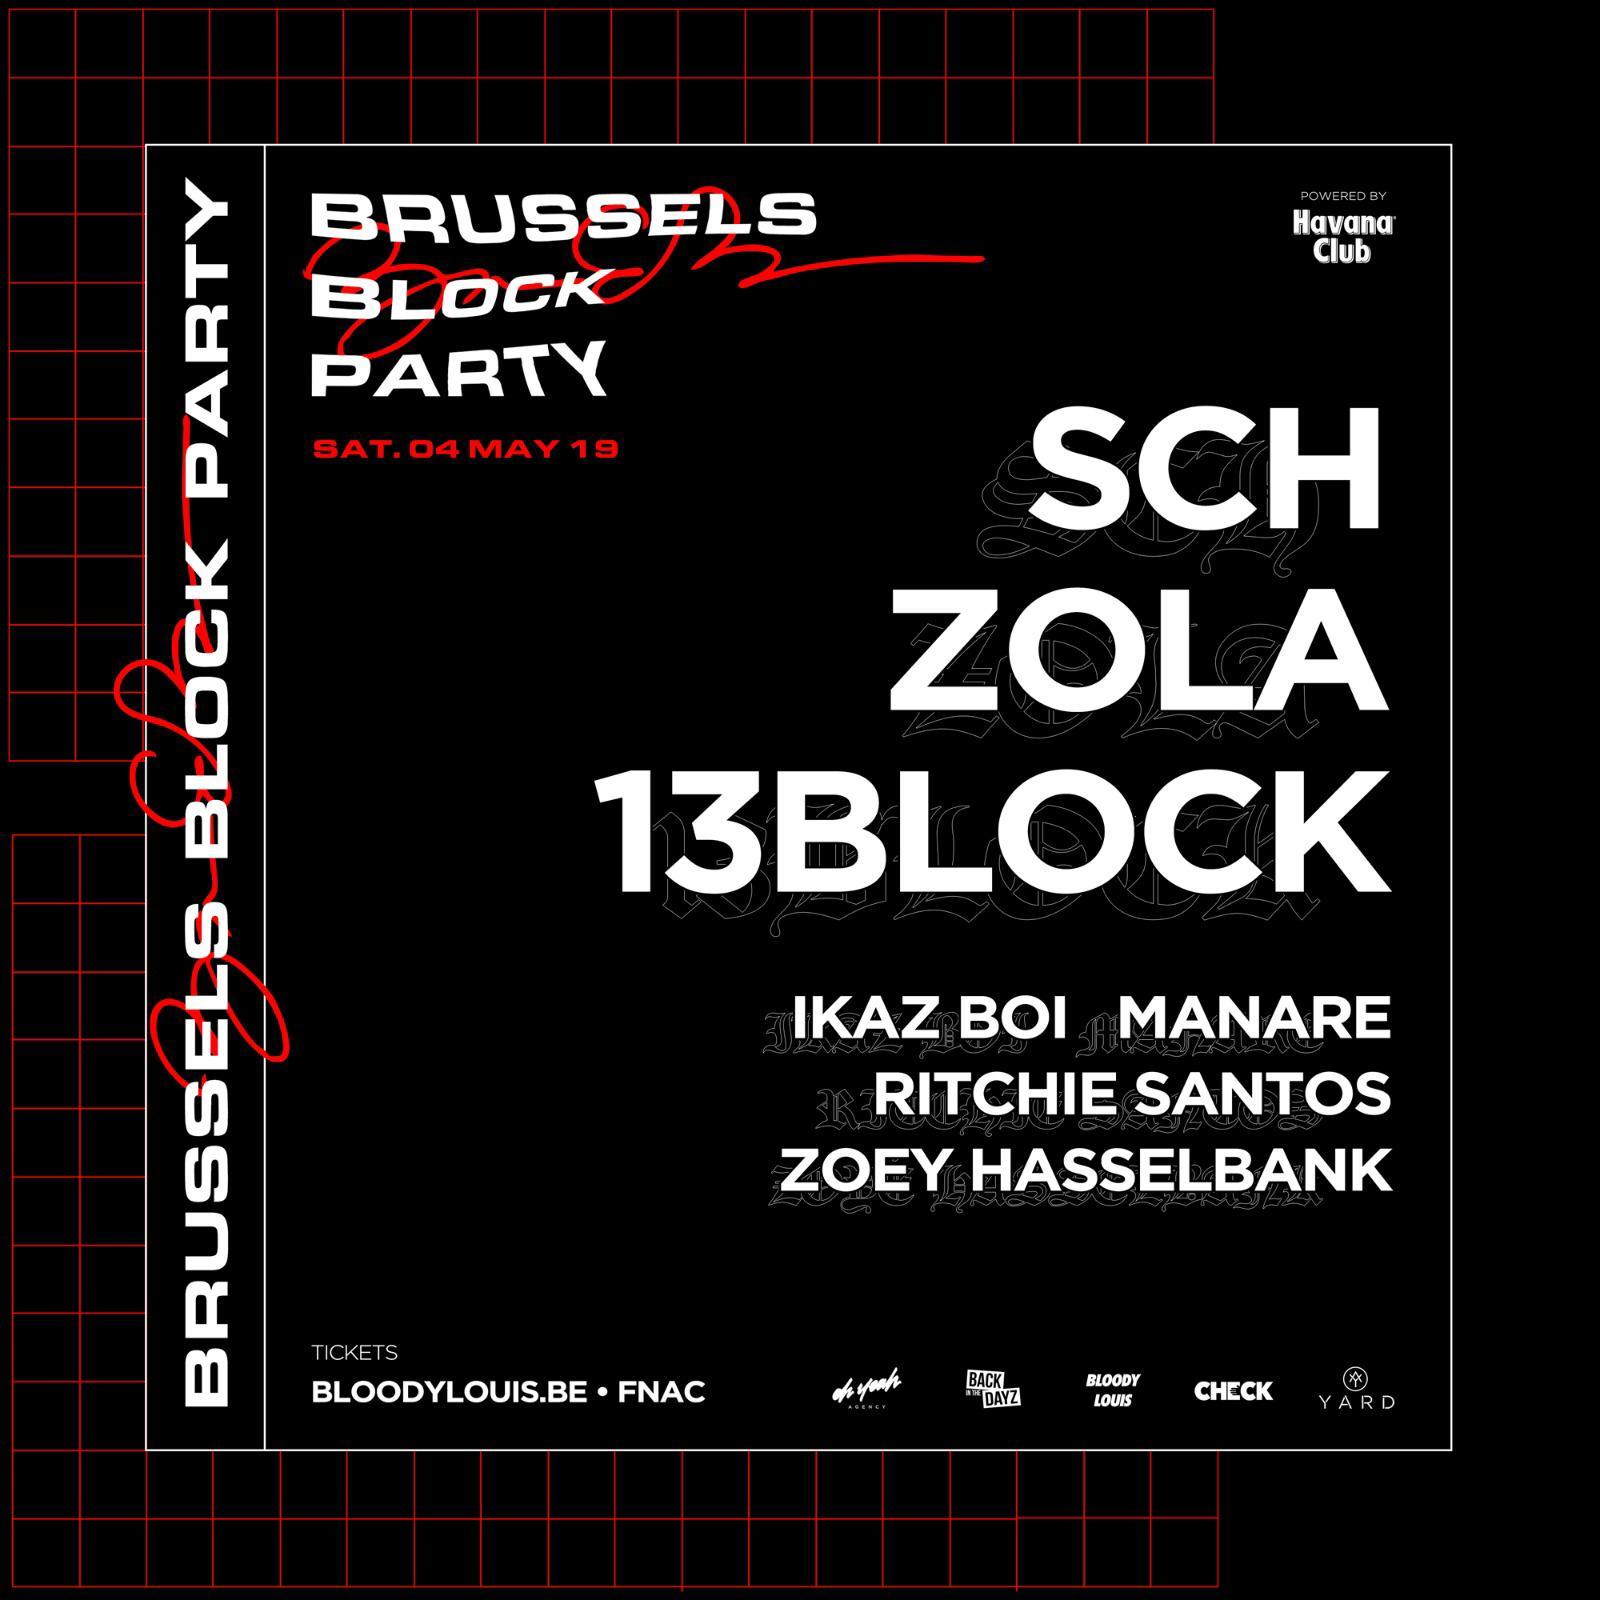 sch-zola-13block